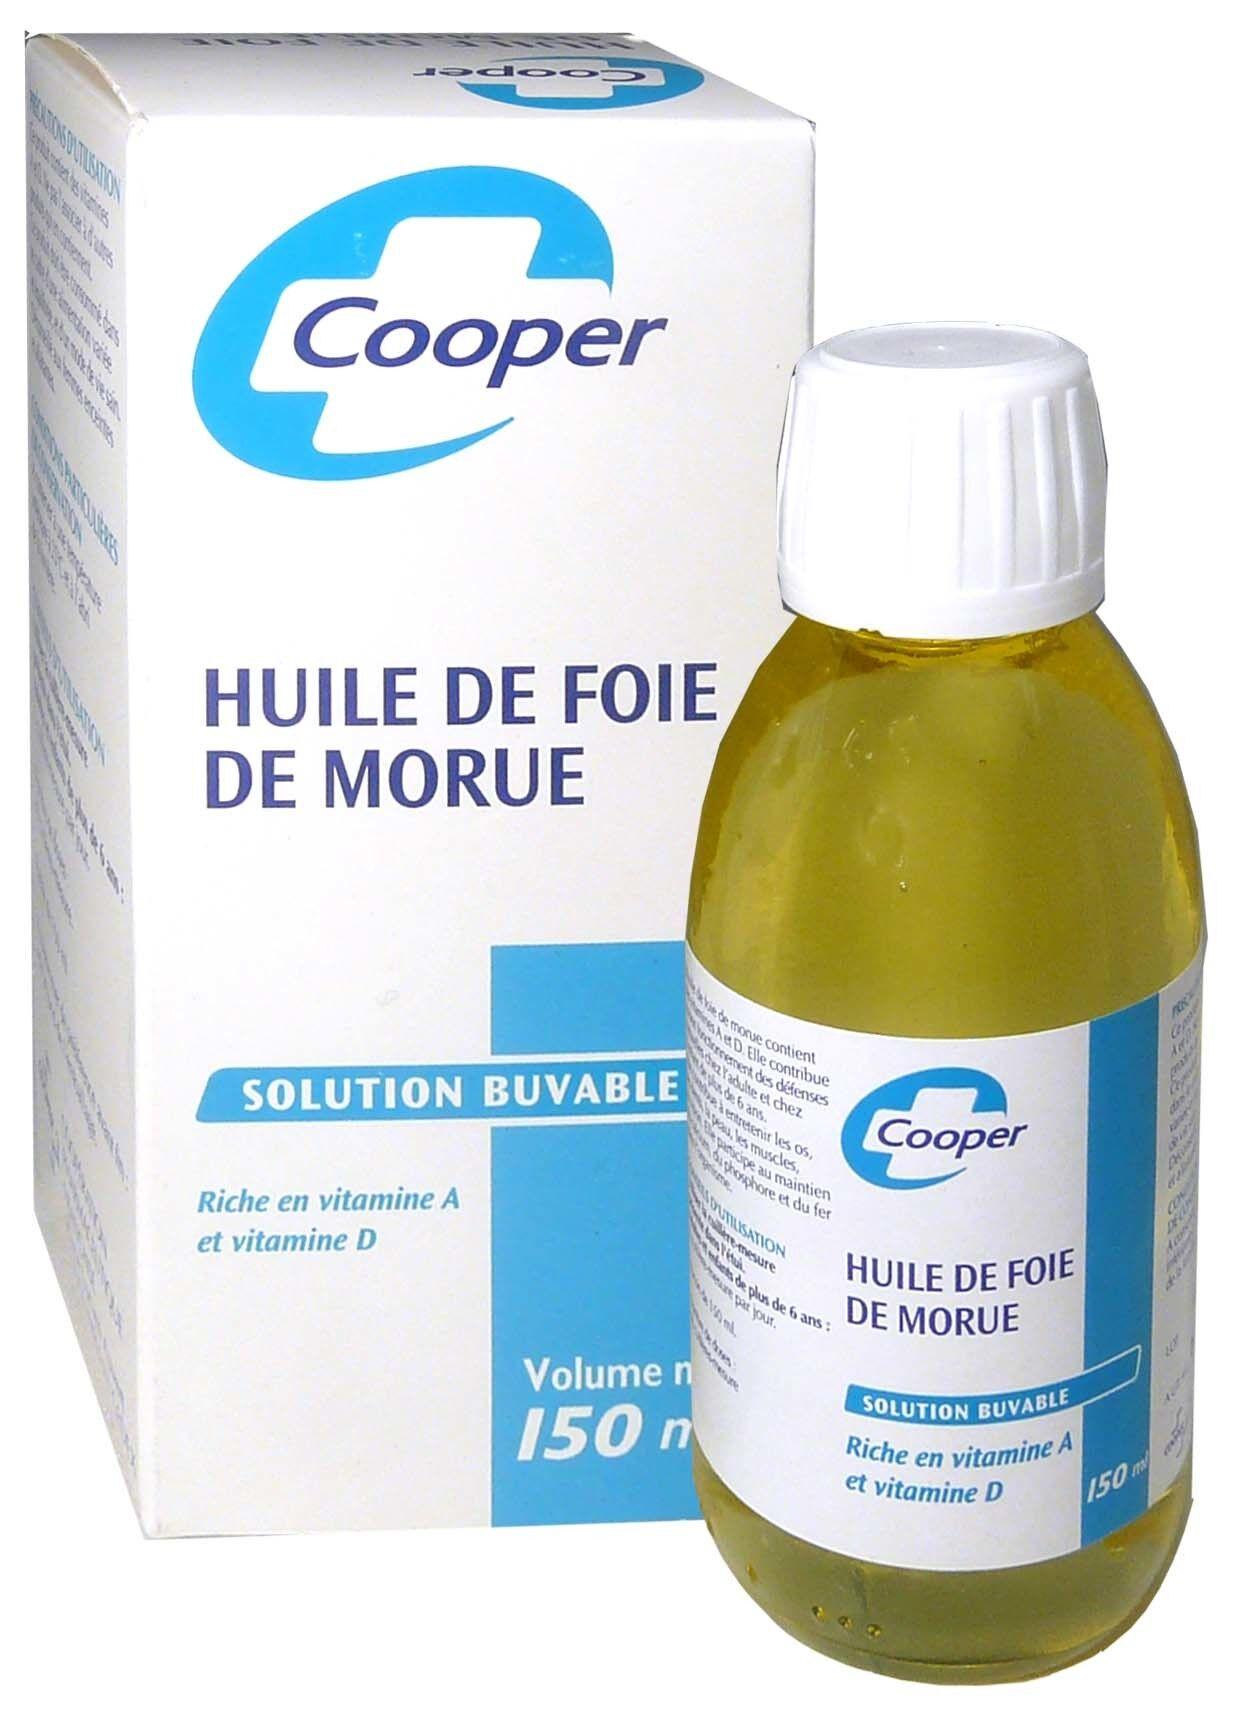 Cooper huile de foie de morue 150ml